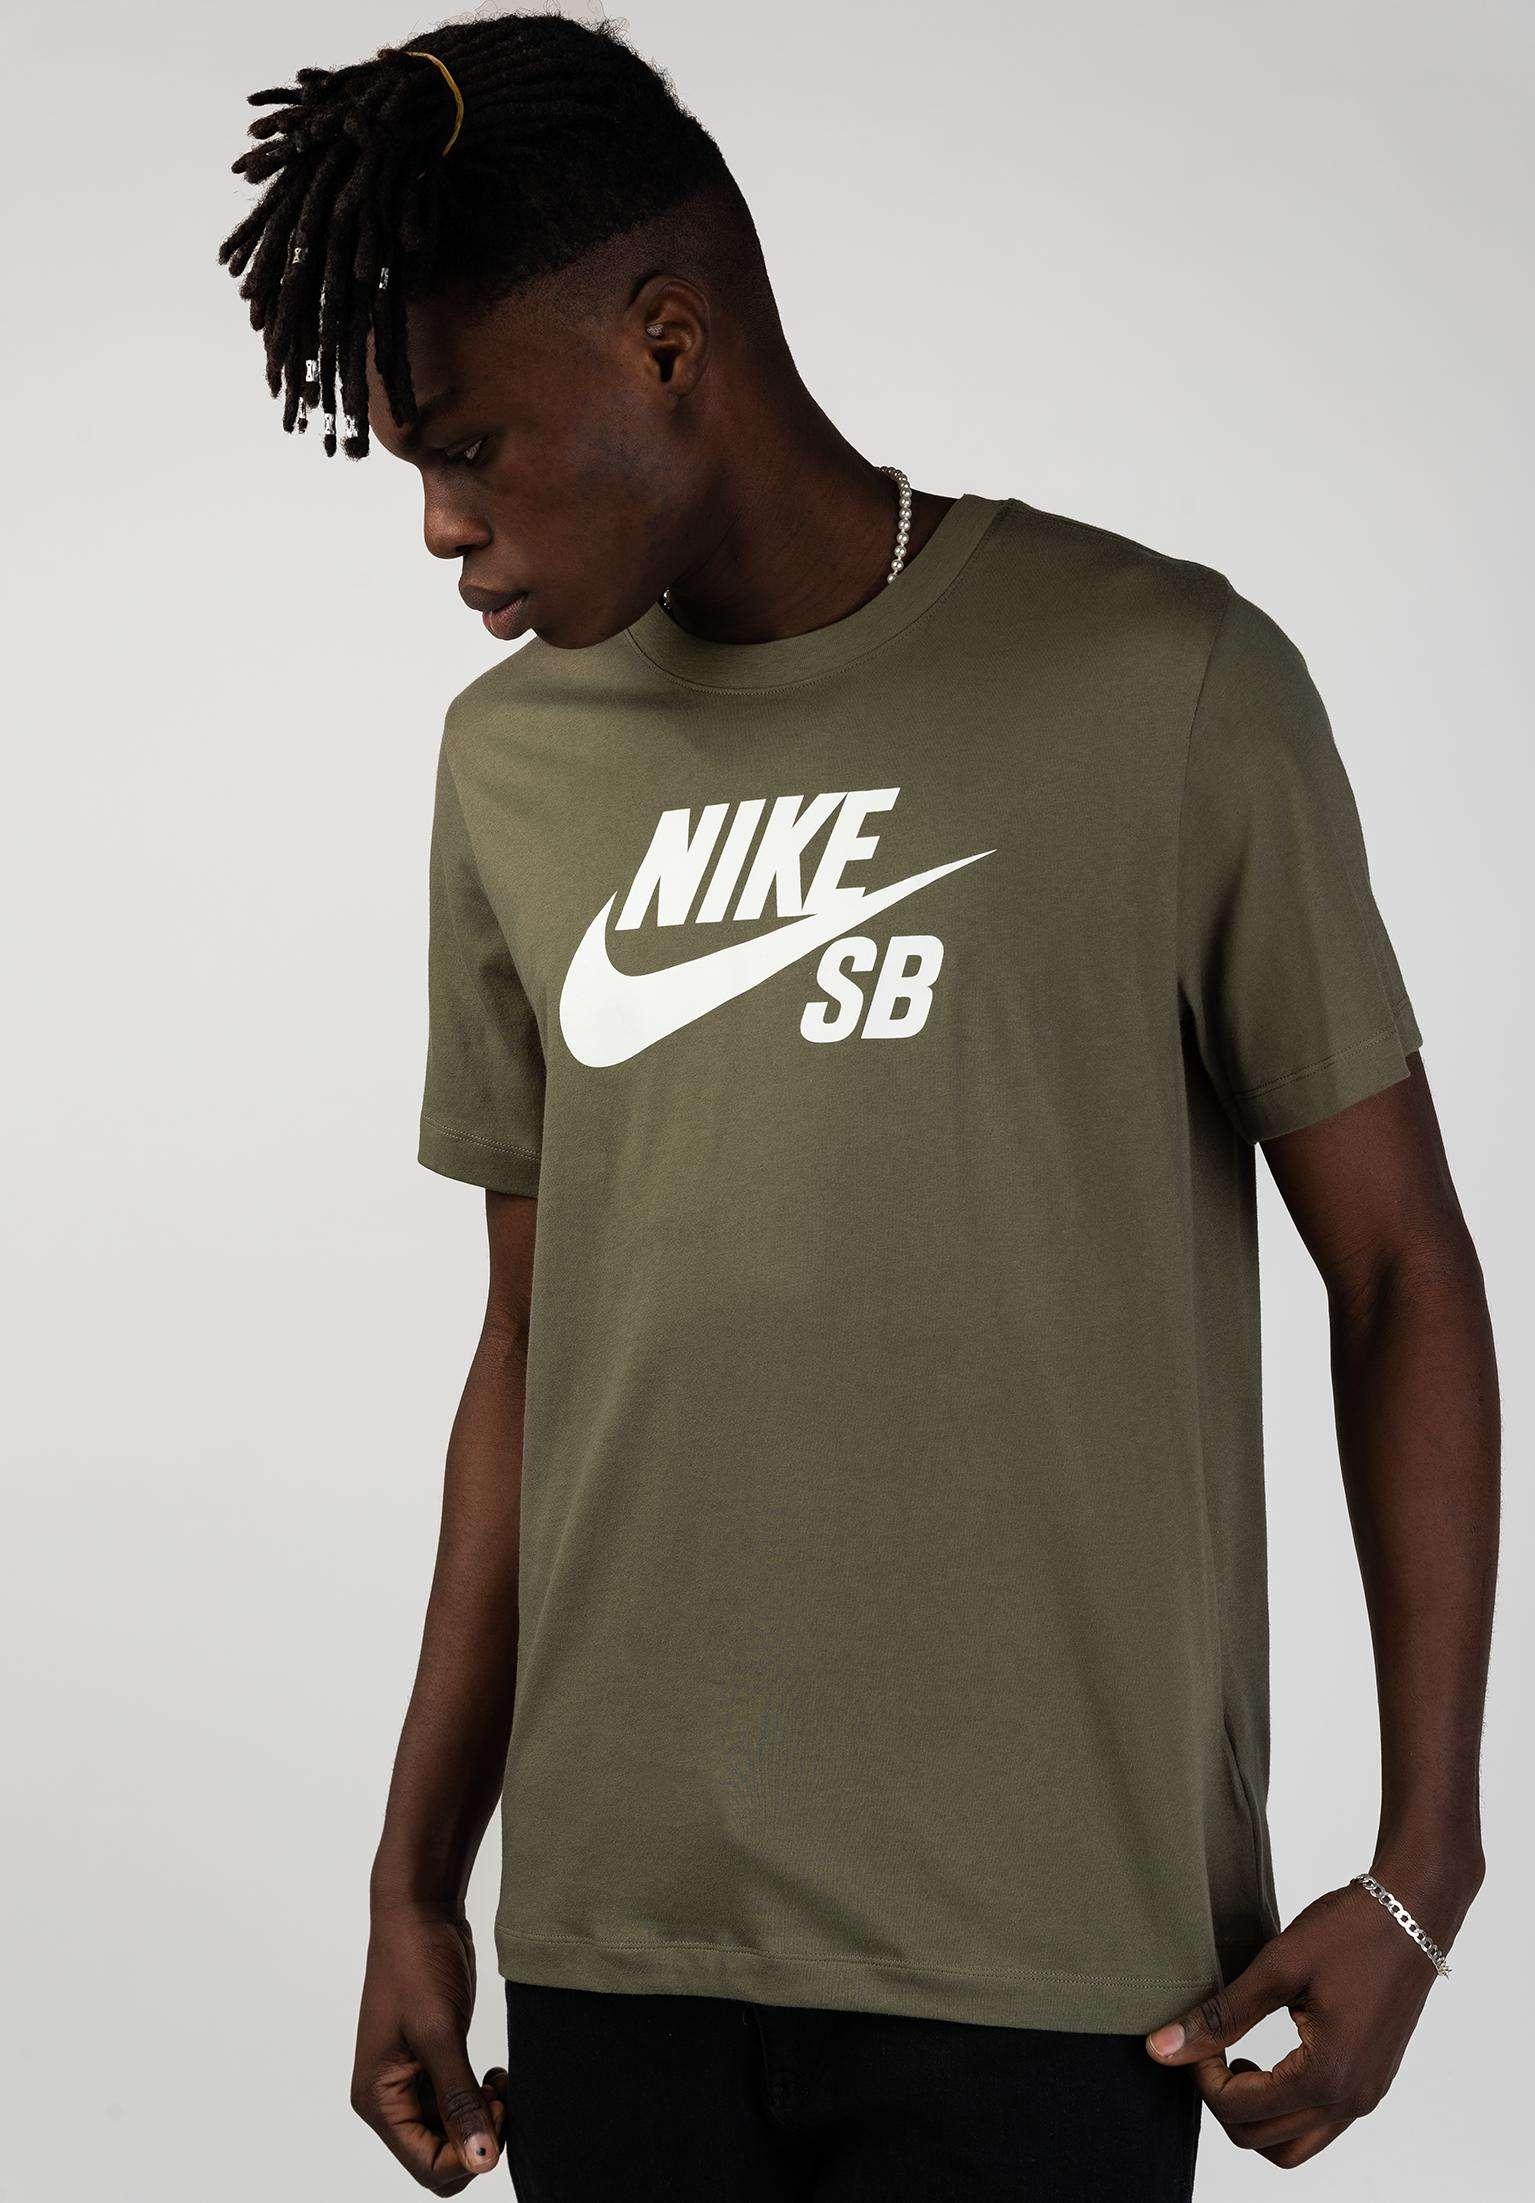 brand new b71d1 04d49 DFT Icon Logo Nike SB T-Shirts in mediumolive-white for Men   Titus